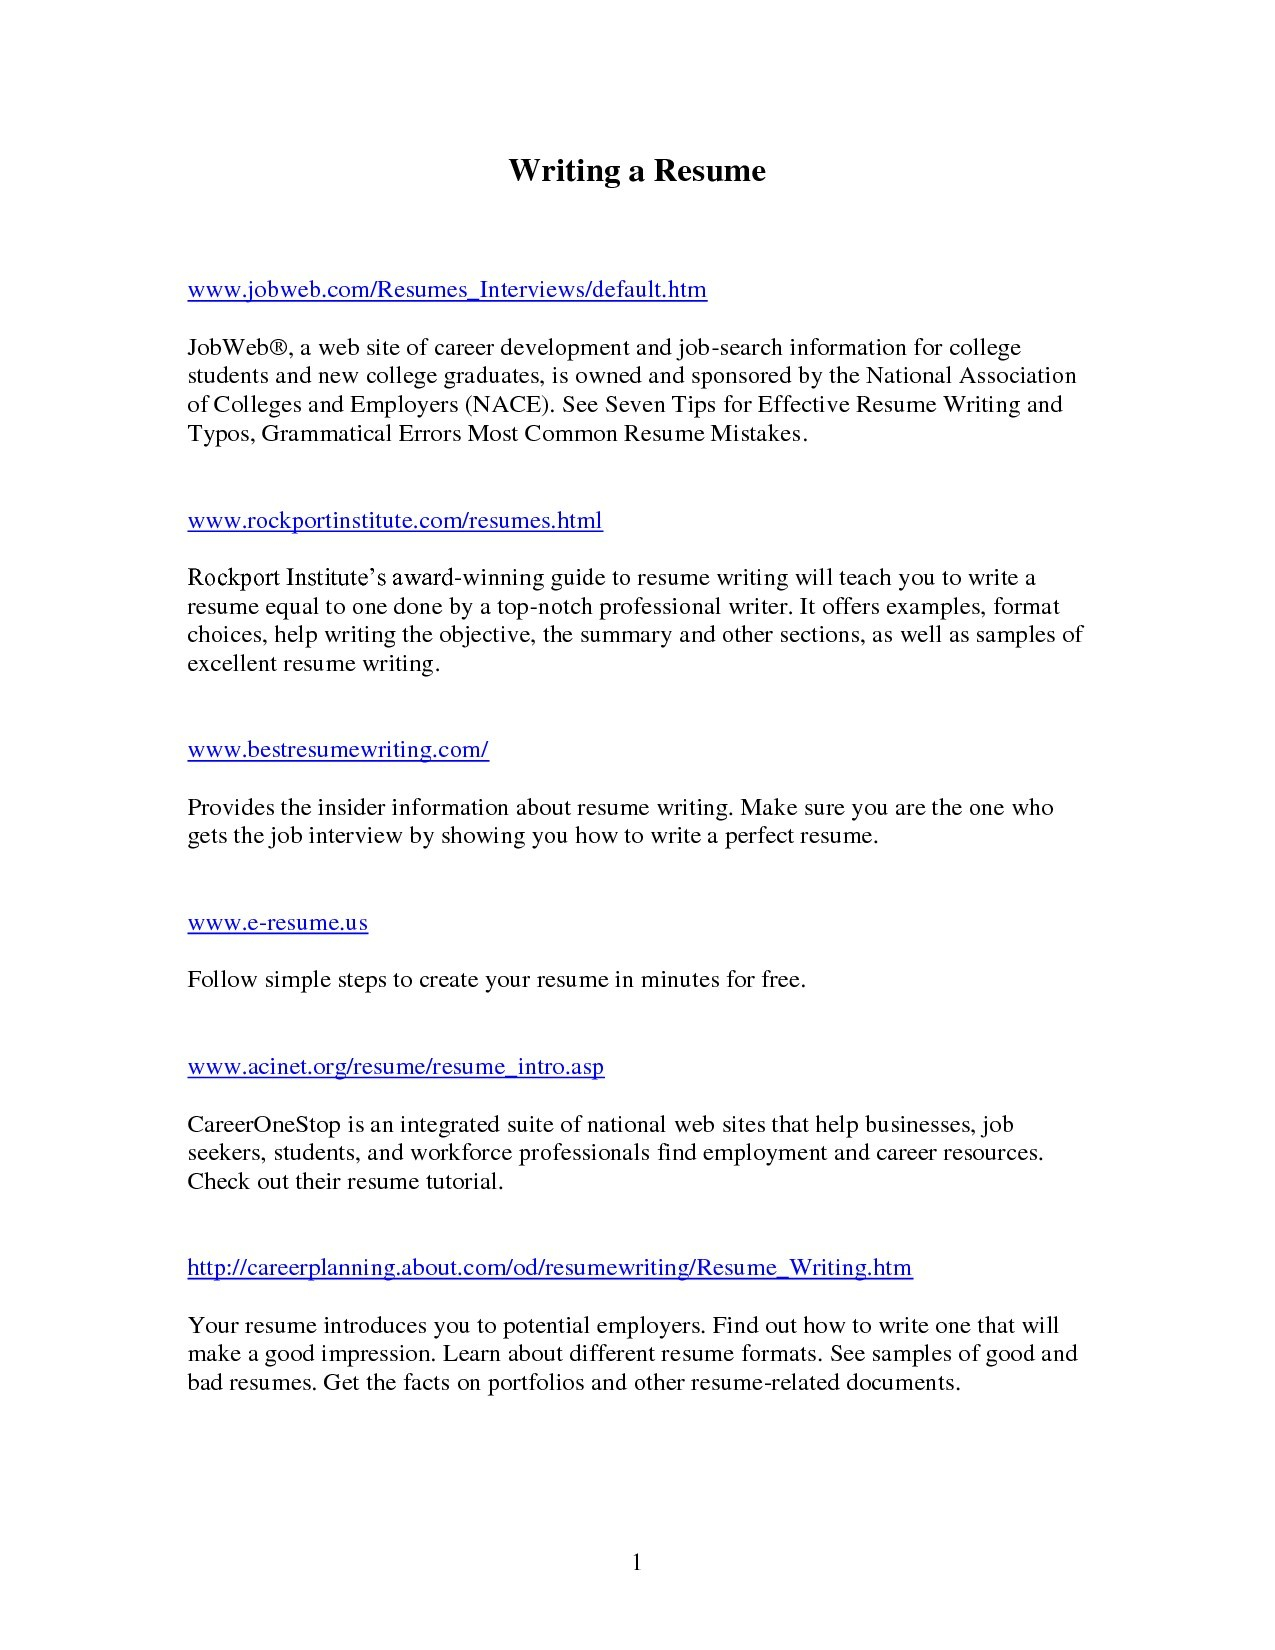 Job Offer Decline Letter Template - Job Fer Rejection Letter Fresh Example Rejection Letter for Job